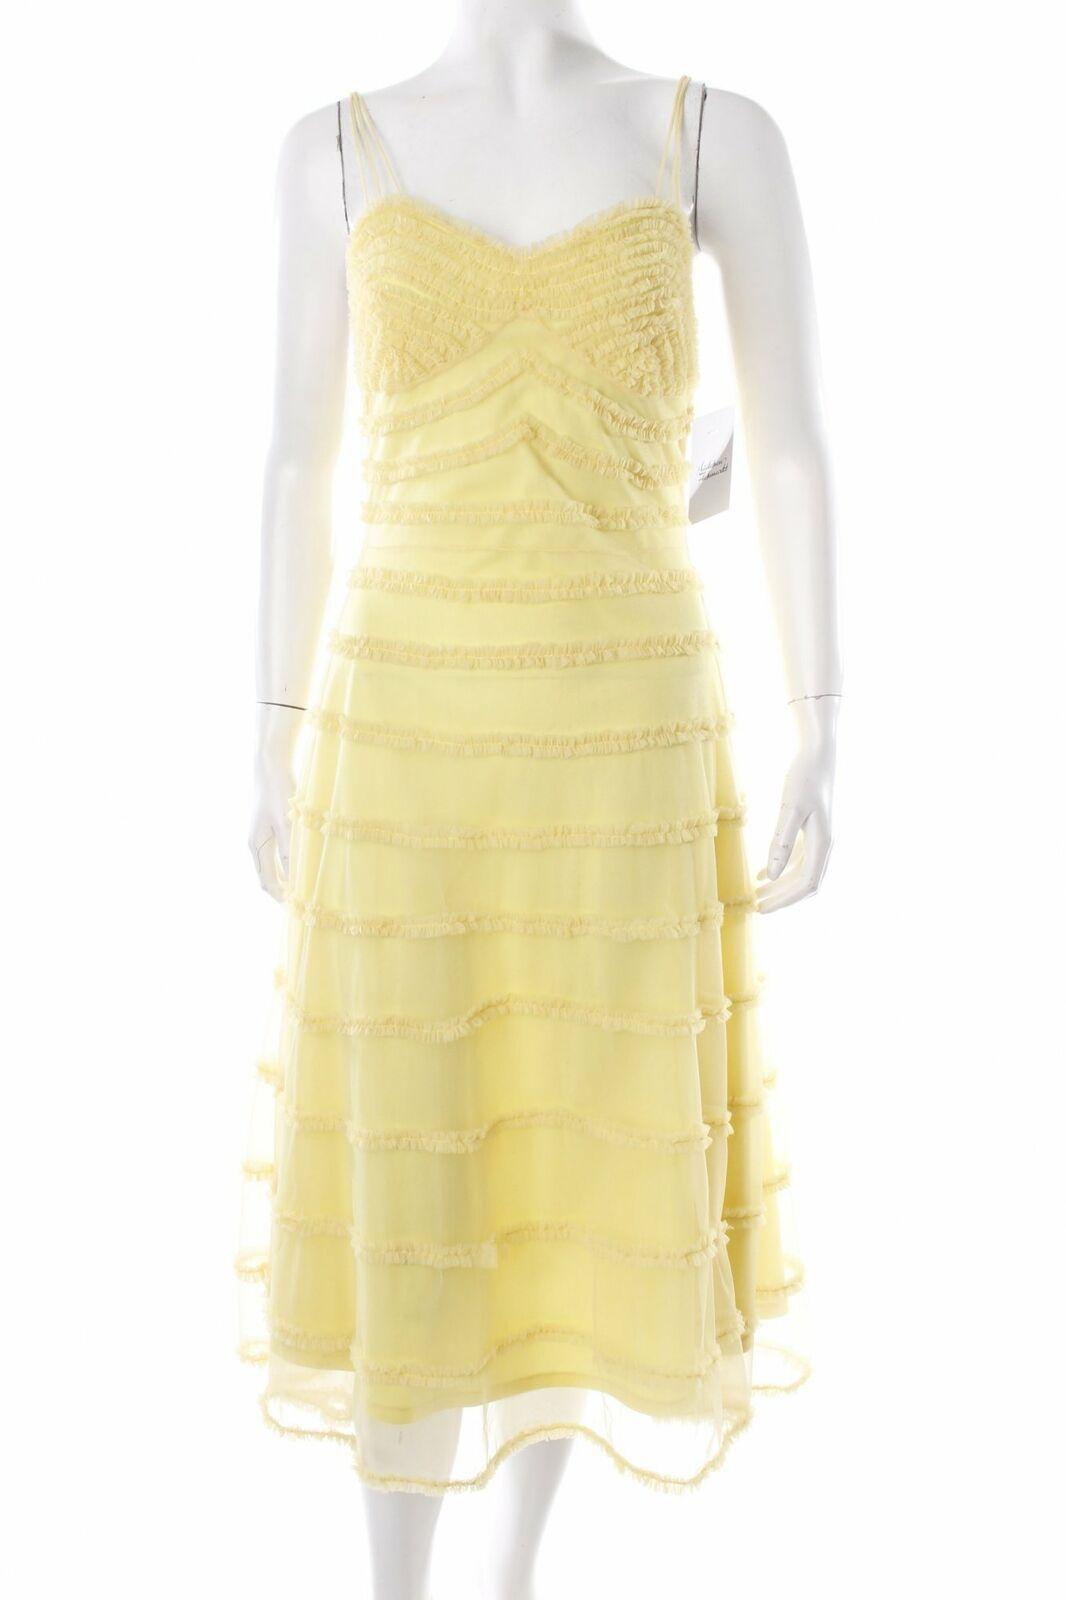 BETSEY JOHNSON Betsy Johnson Cocktailkleid gelb extravaganter Stil Damen Kleid